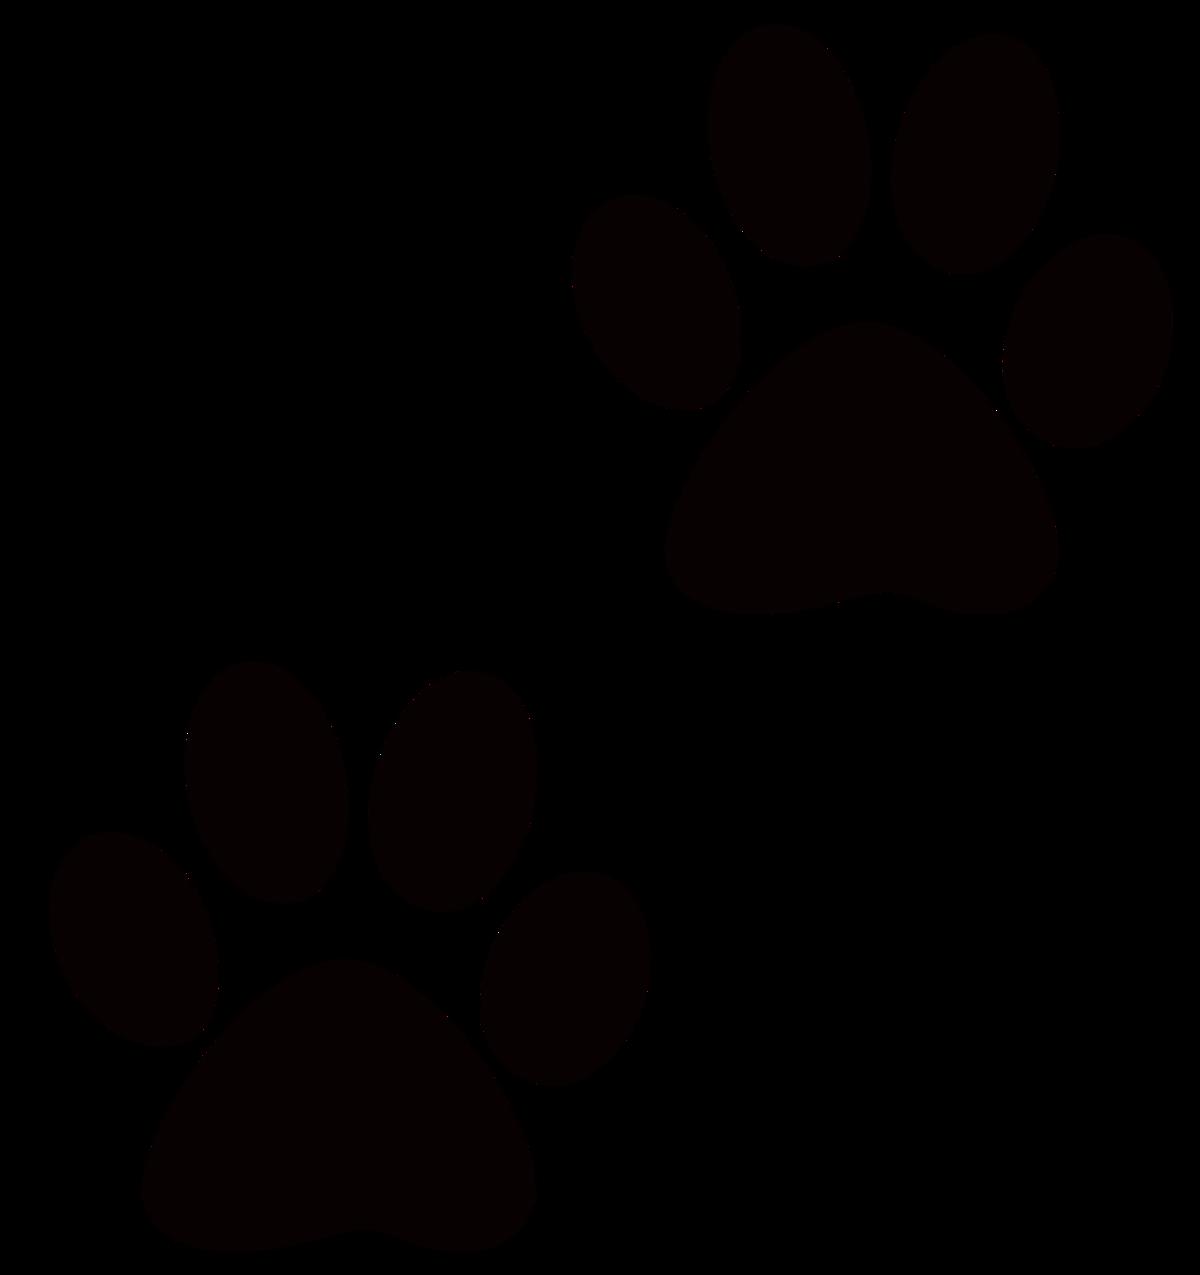 группу картинка отпечатка кошачьей лапки учению